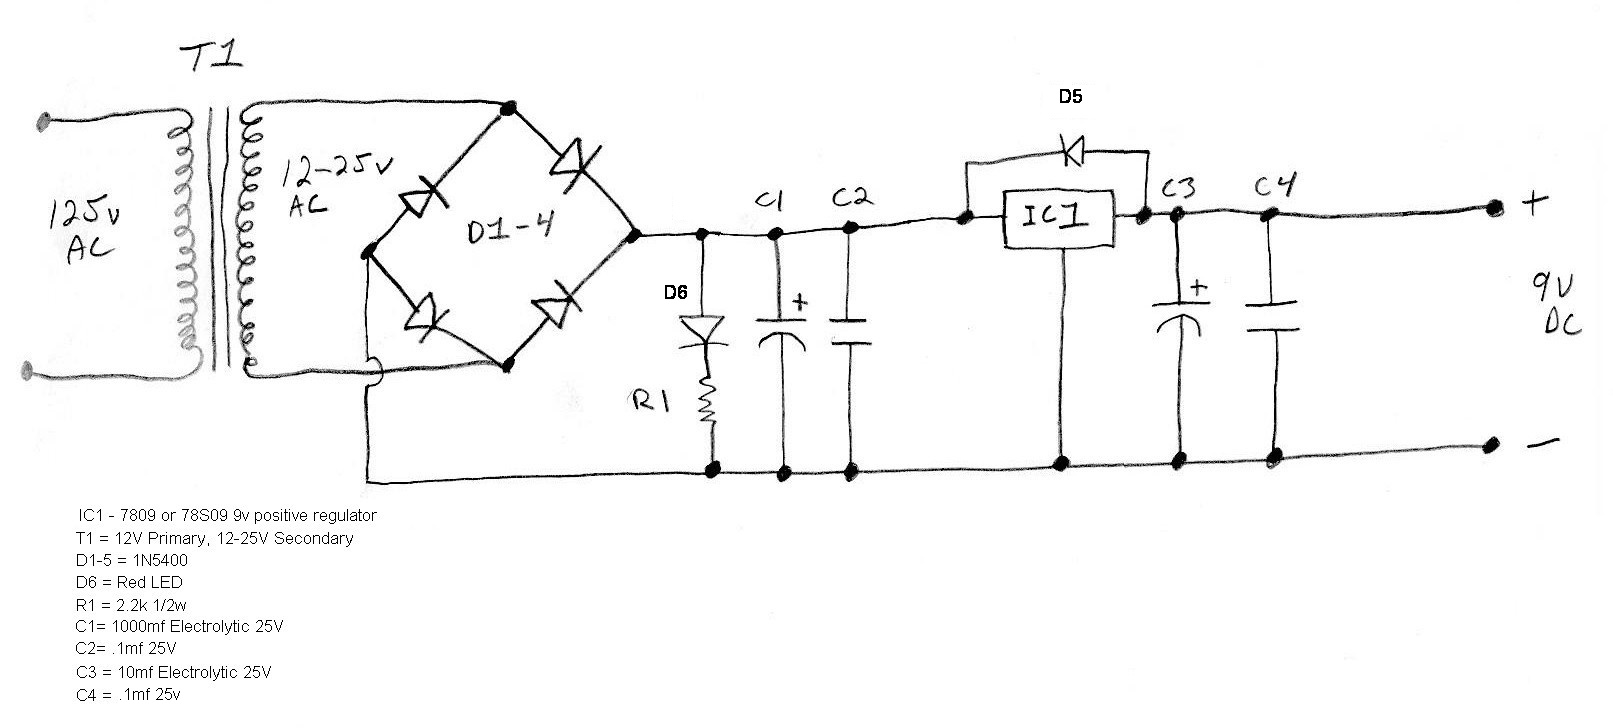 hight resolution of my power supply schematic